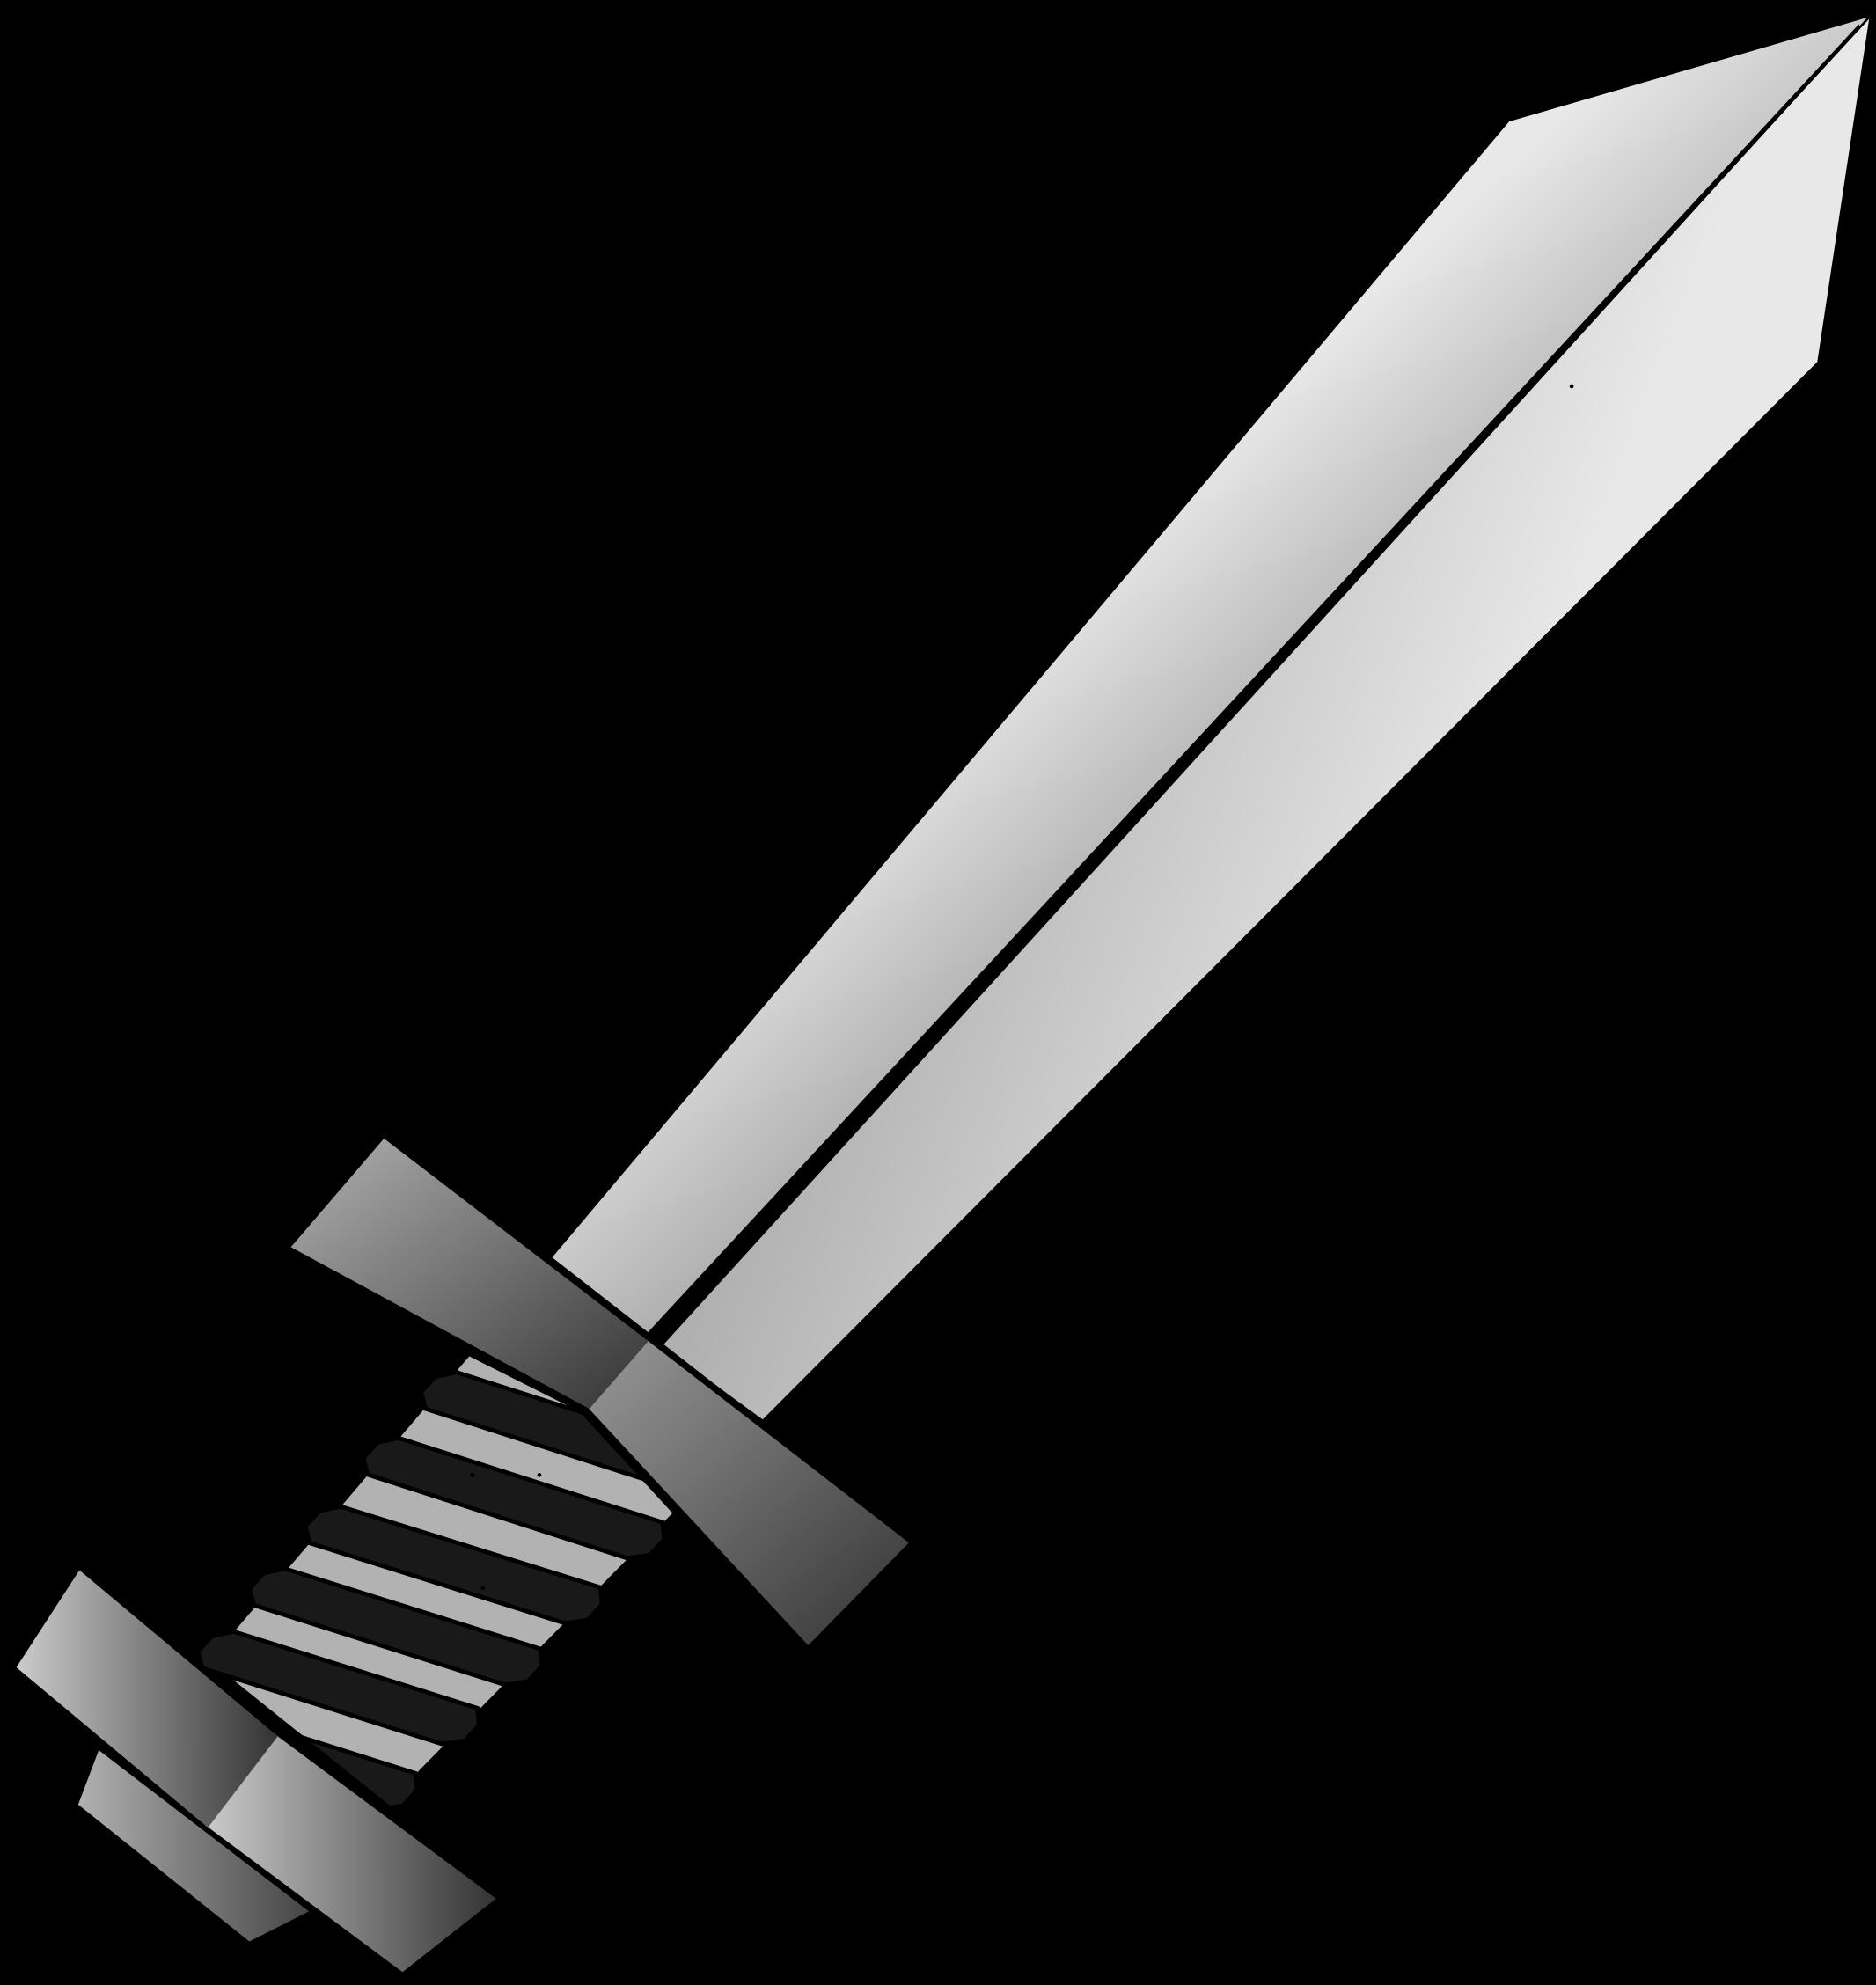 Sword clipart Download clipart Sword #6 clipart